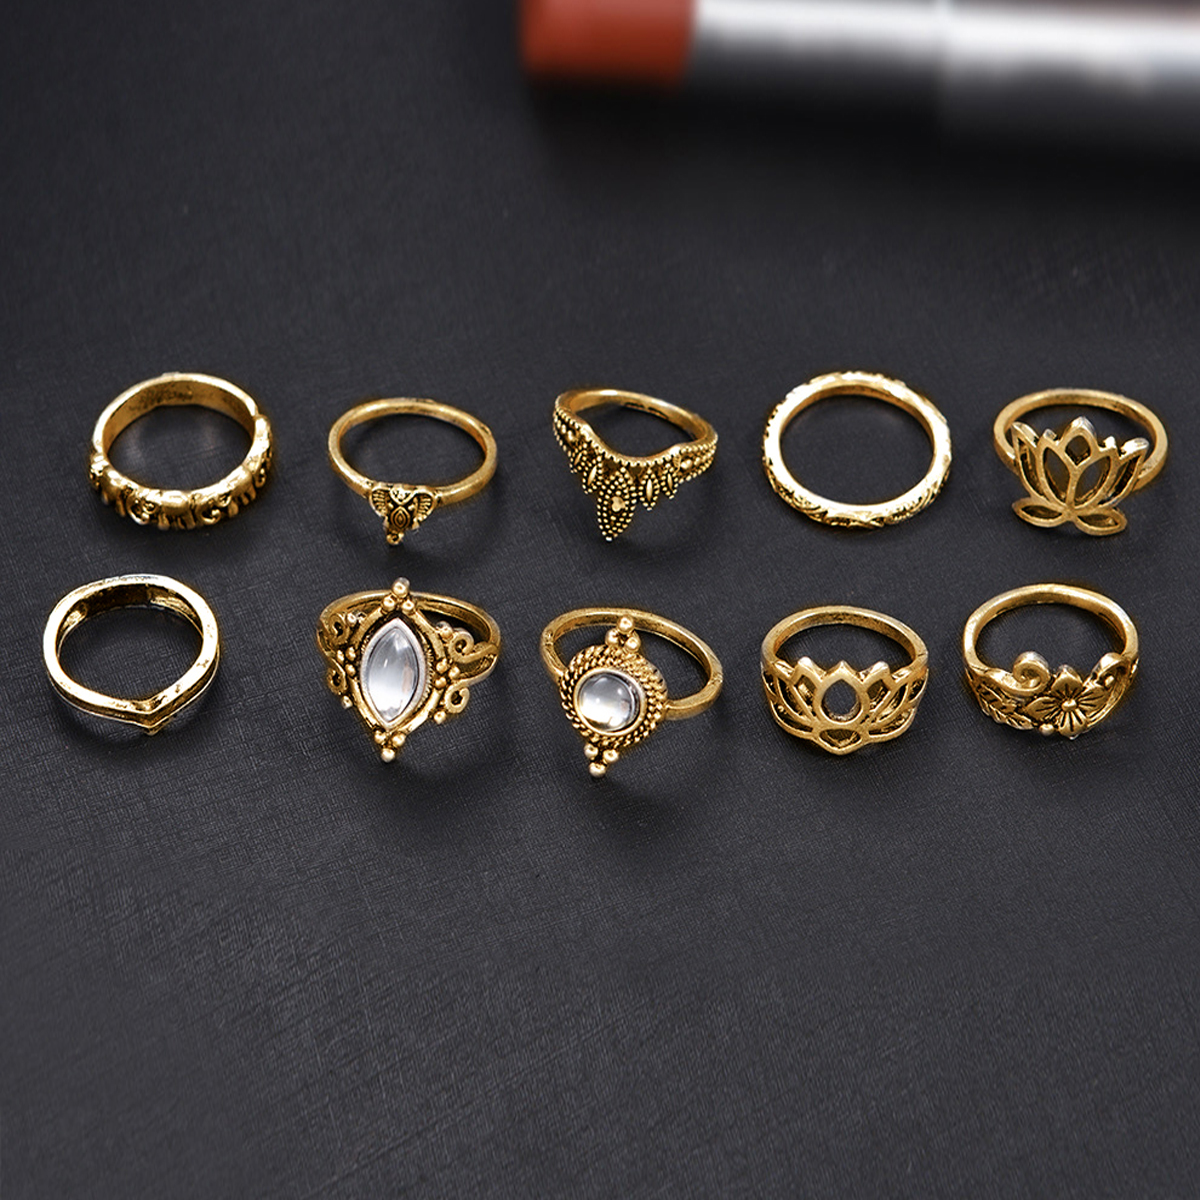 Golden 10pcs/Set Vintage Bohemian Ring Set (Less than 1$ each)